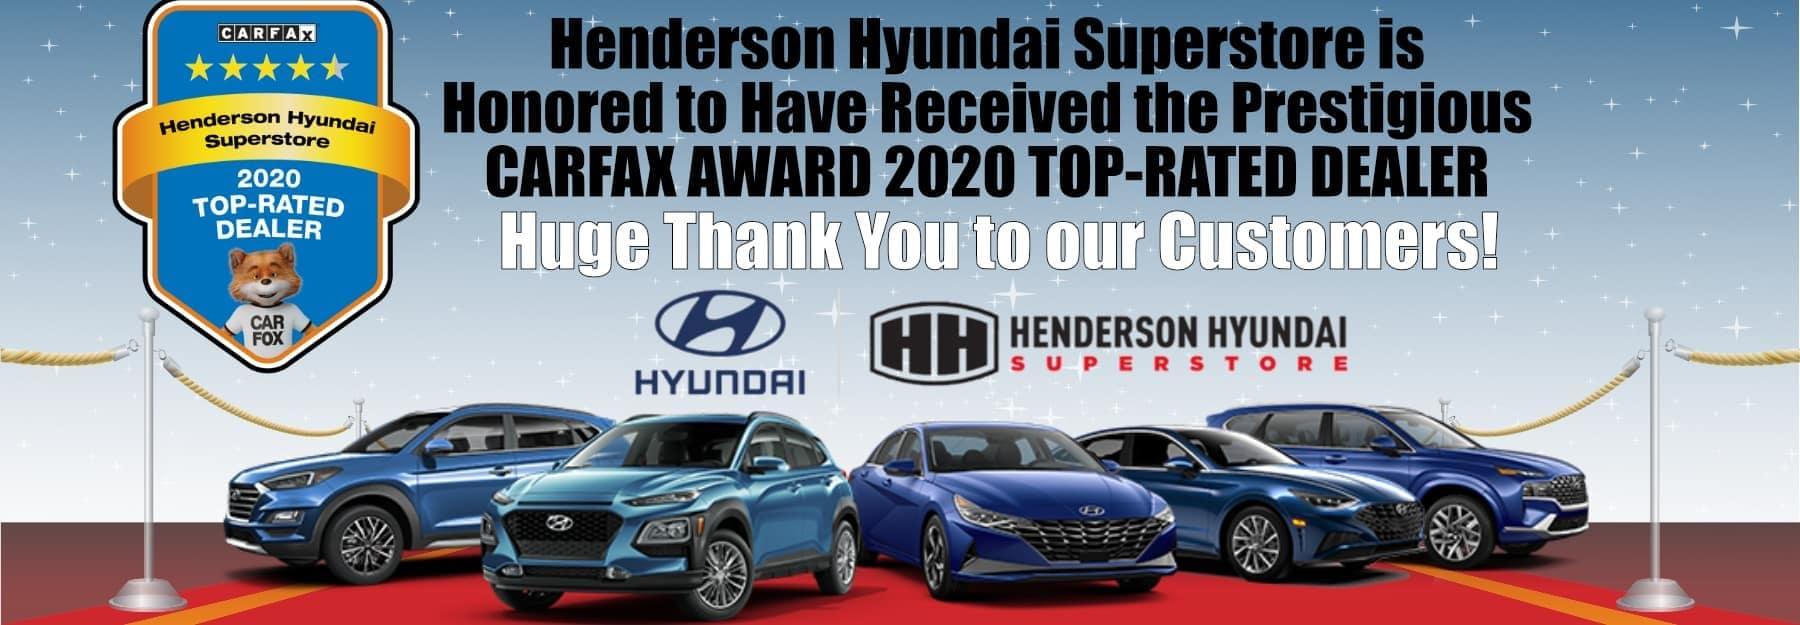 March_2021-CarFaxAward_2021_Henderson-Hyundai